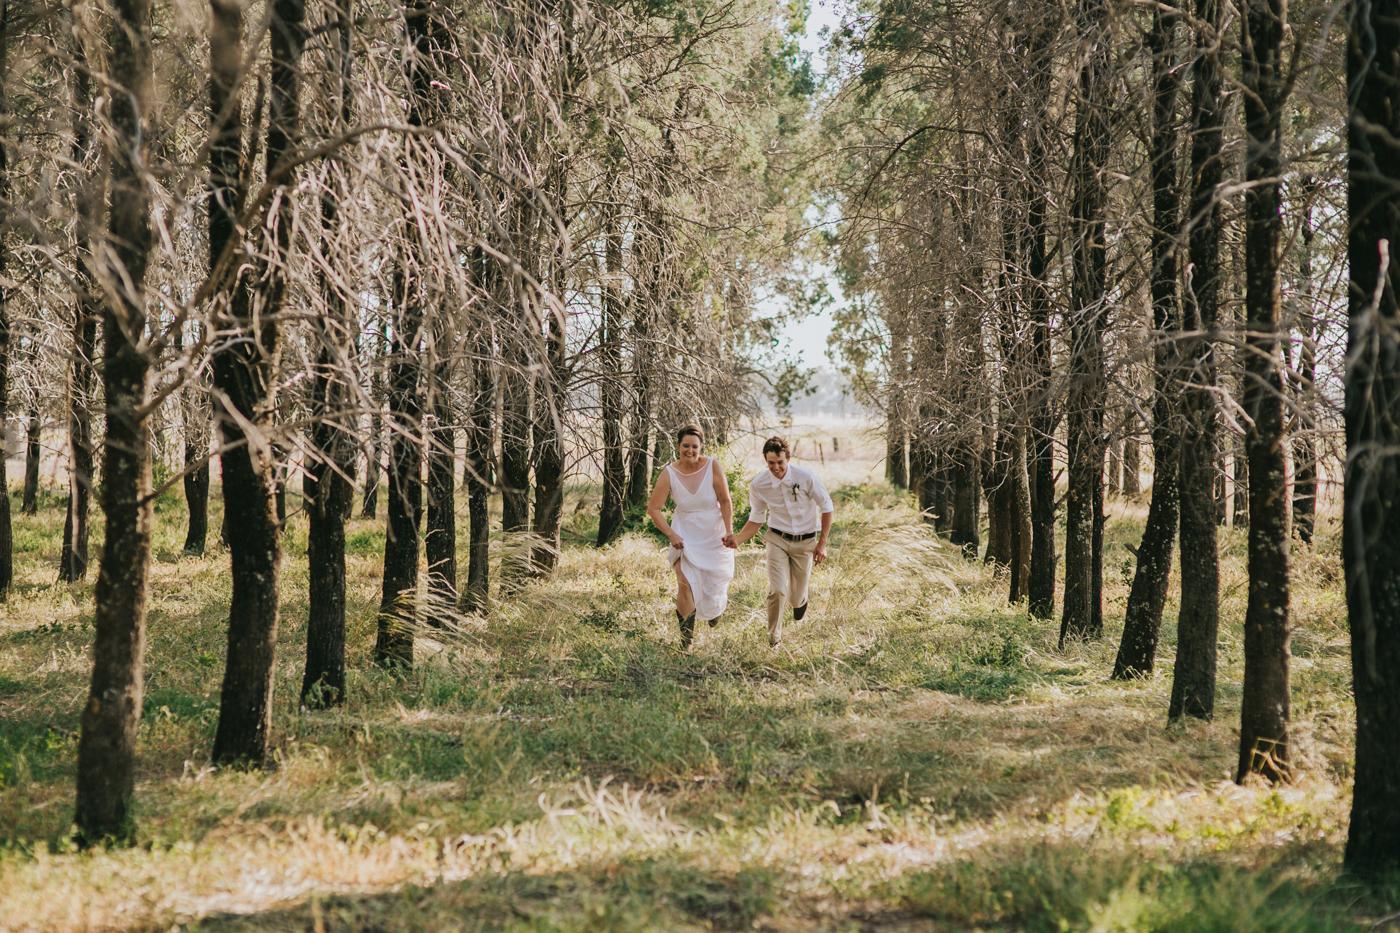 Nicolle & Jacob - Dubbo Wedding - Country Australia - Samantha Heather Photography-186.jpg